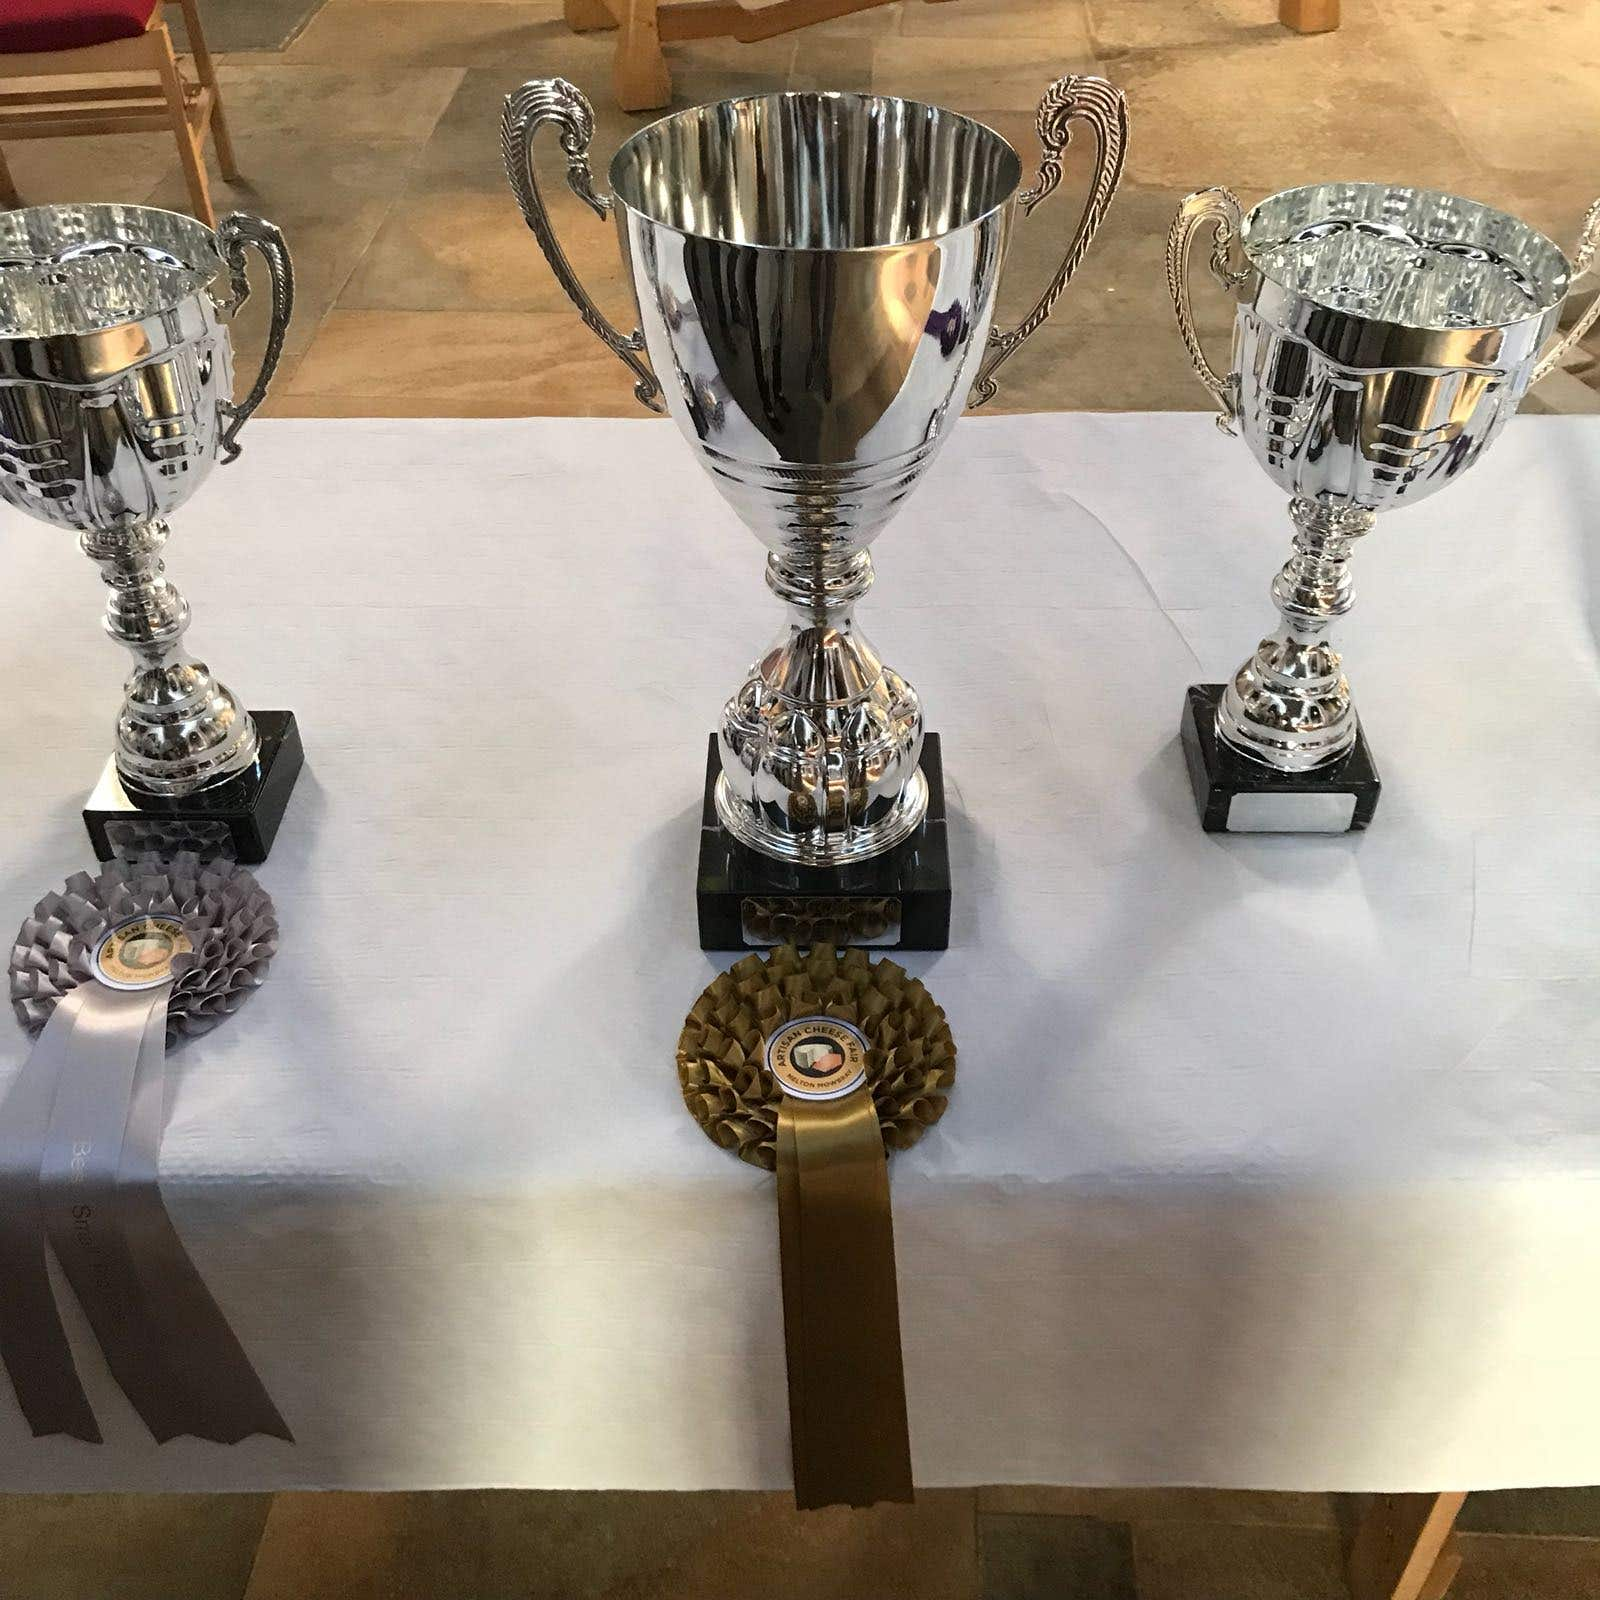 The Artisan Cheese Awards 2018